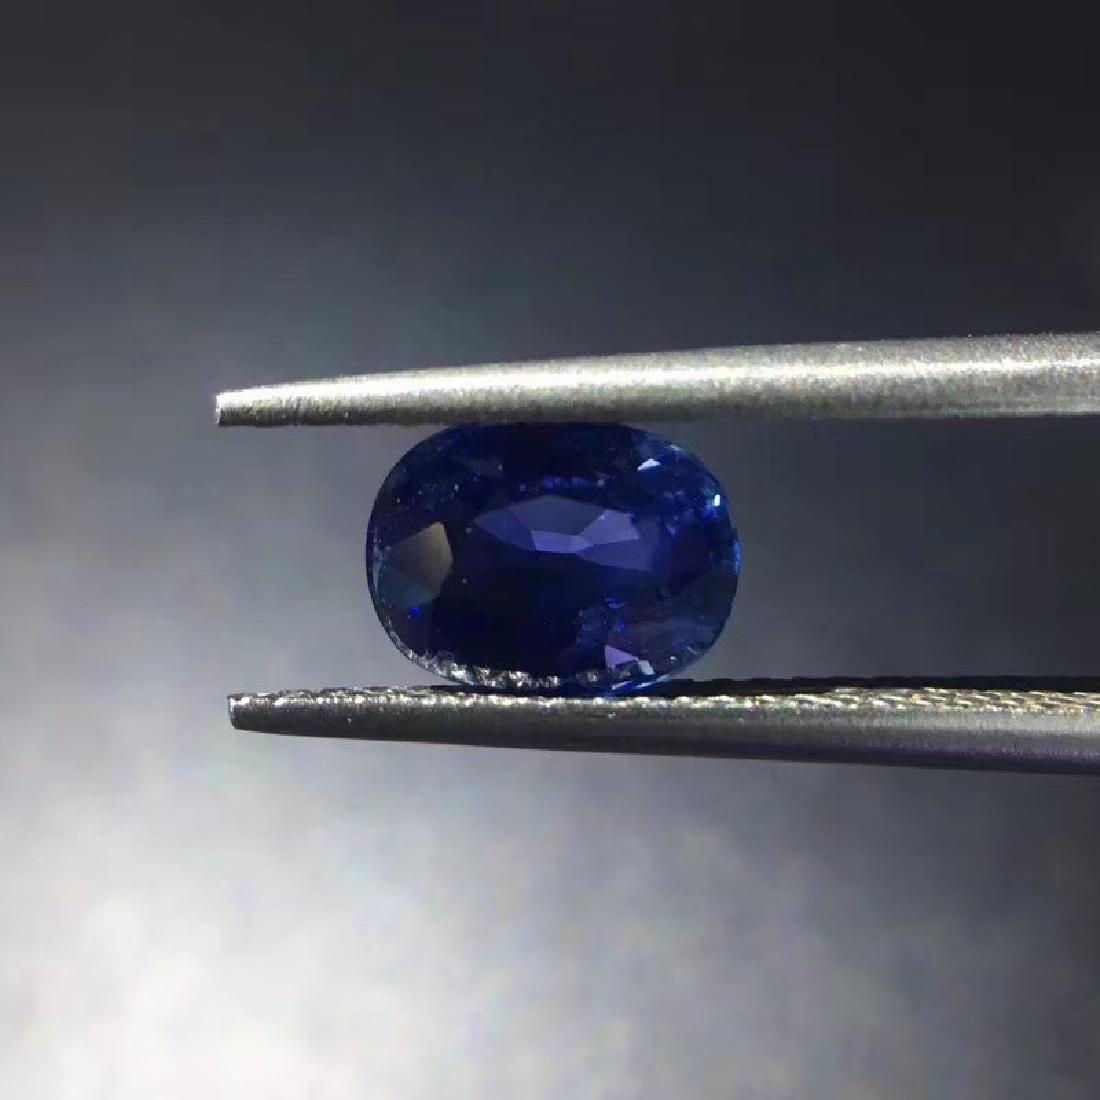 1.43 ct Sapphire 5.8*7.6*3.4 mm Oval Cut